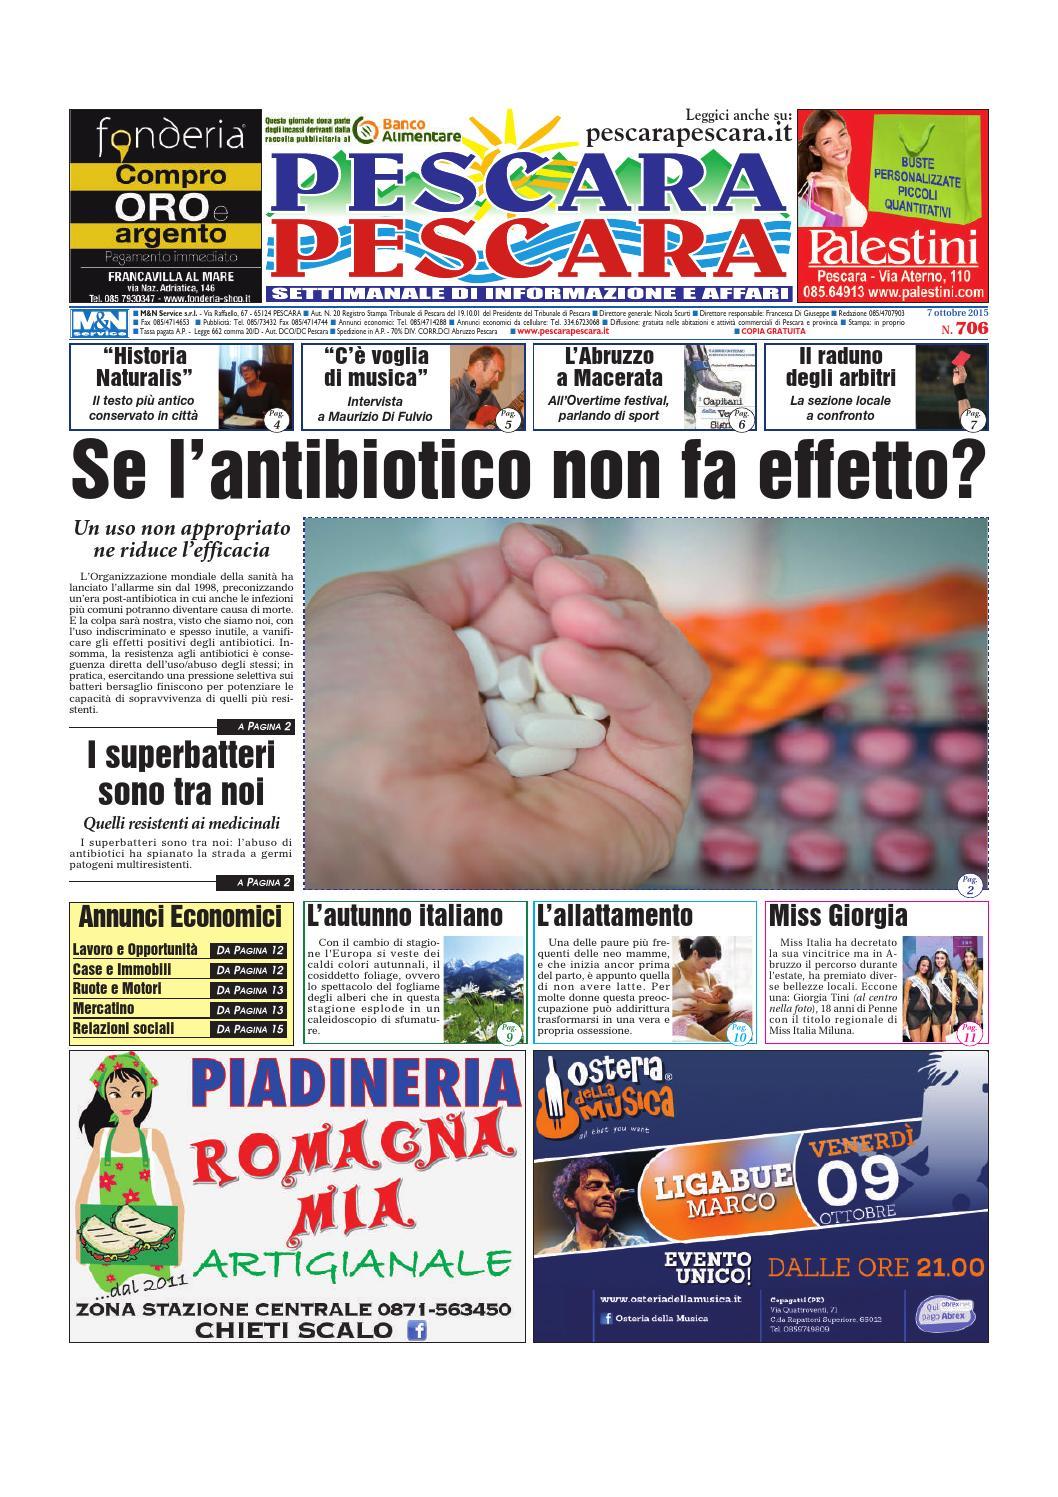 PescaraPescara n° 706 07 10 2015 by PescaraPescara - issuu 06f09009b16